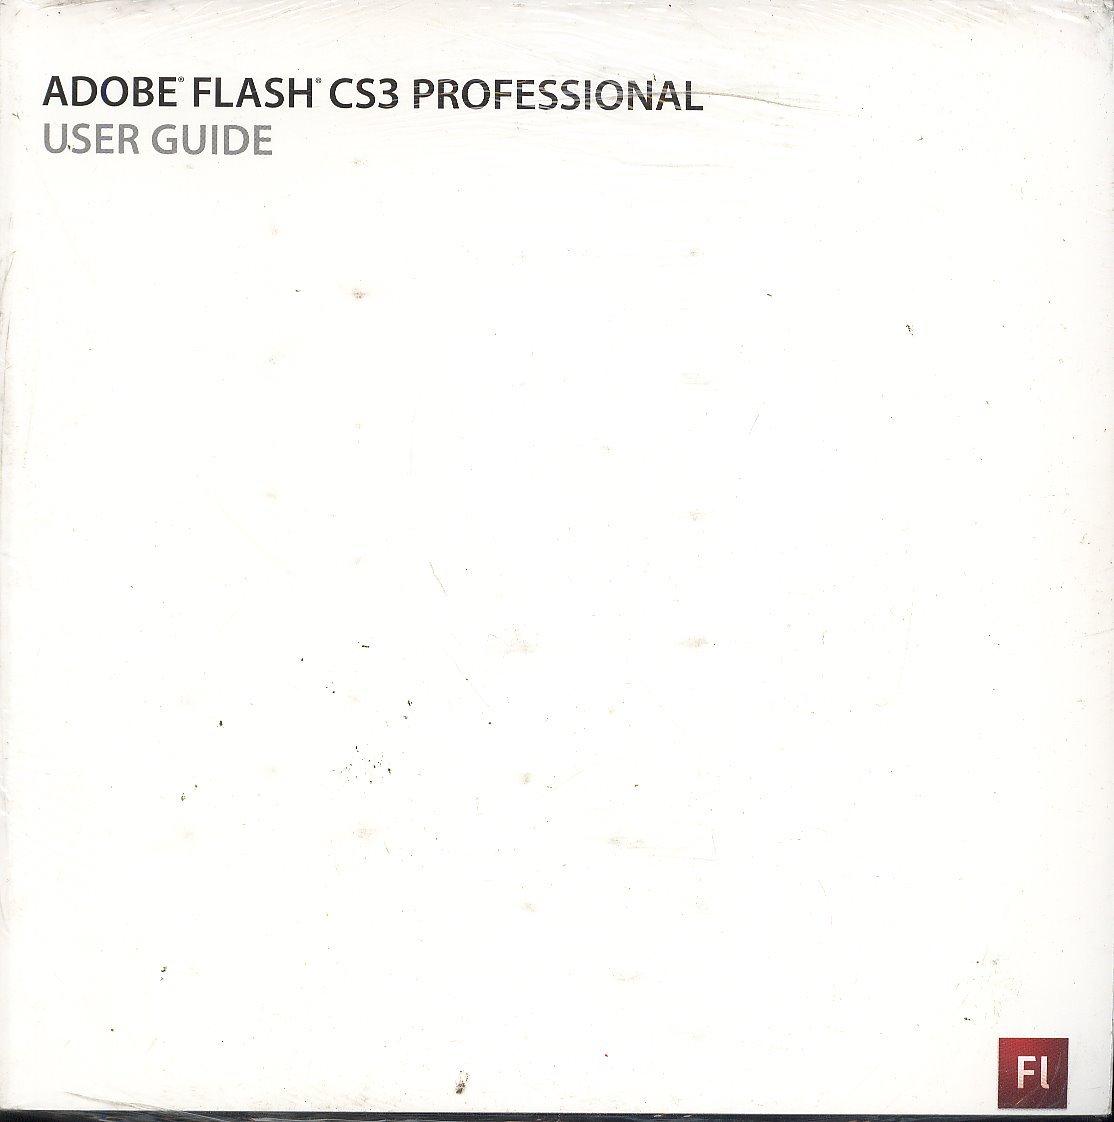 adobe flash cs3 professional user guide adobe amazon com books rh amazon com adobe flash professional guide Adobe Flash Professional CC